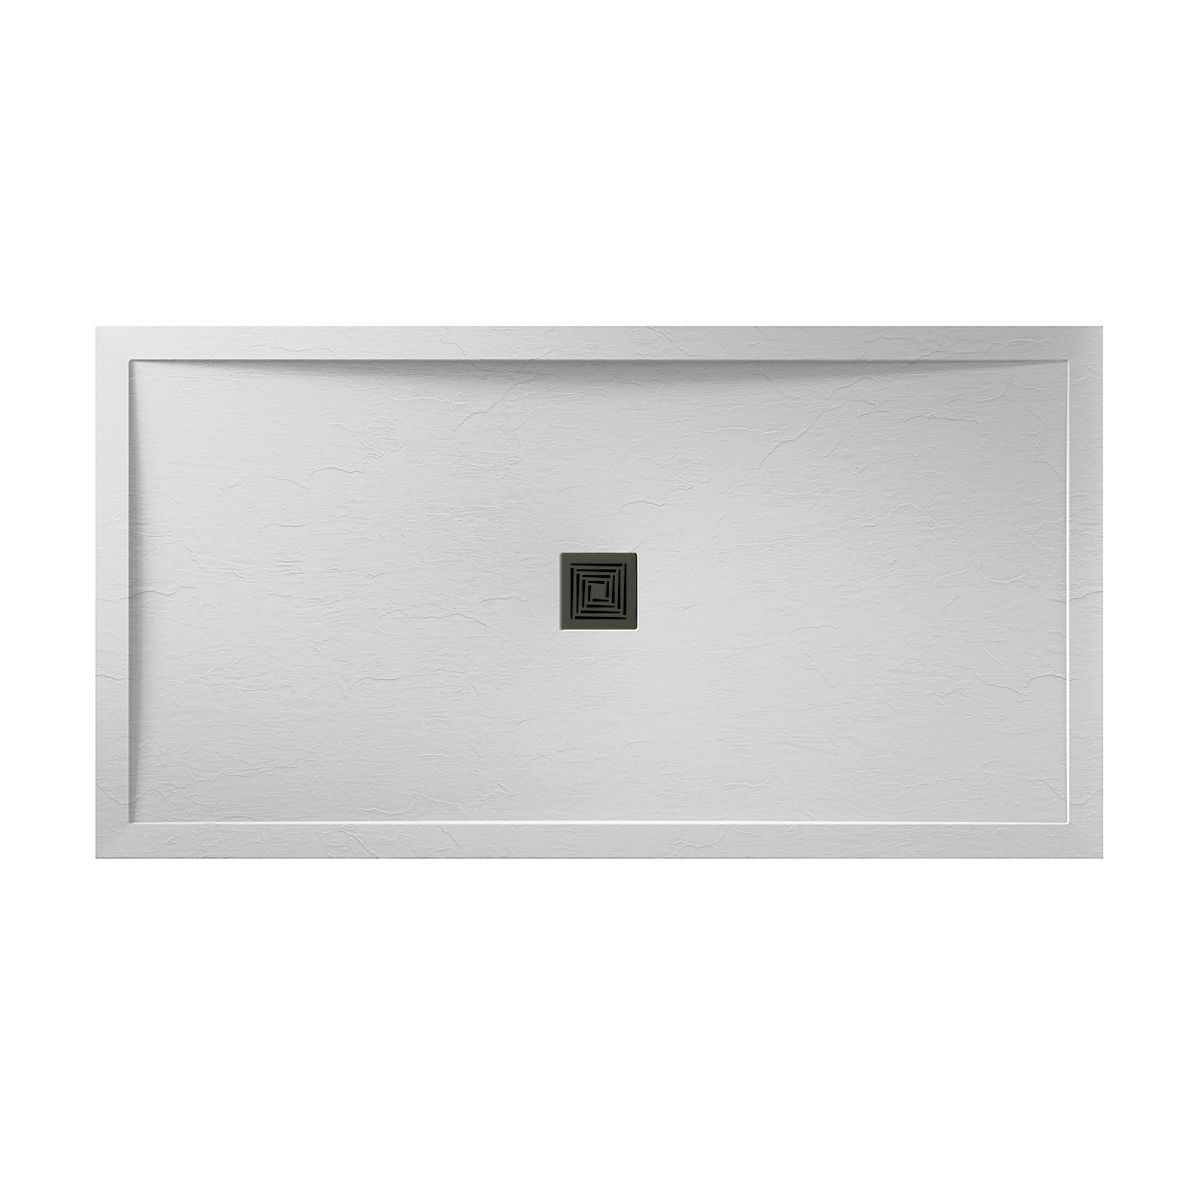 Aquadart White Slate Shower Tray 1200 x 800